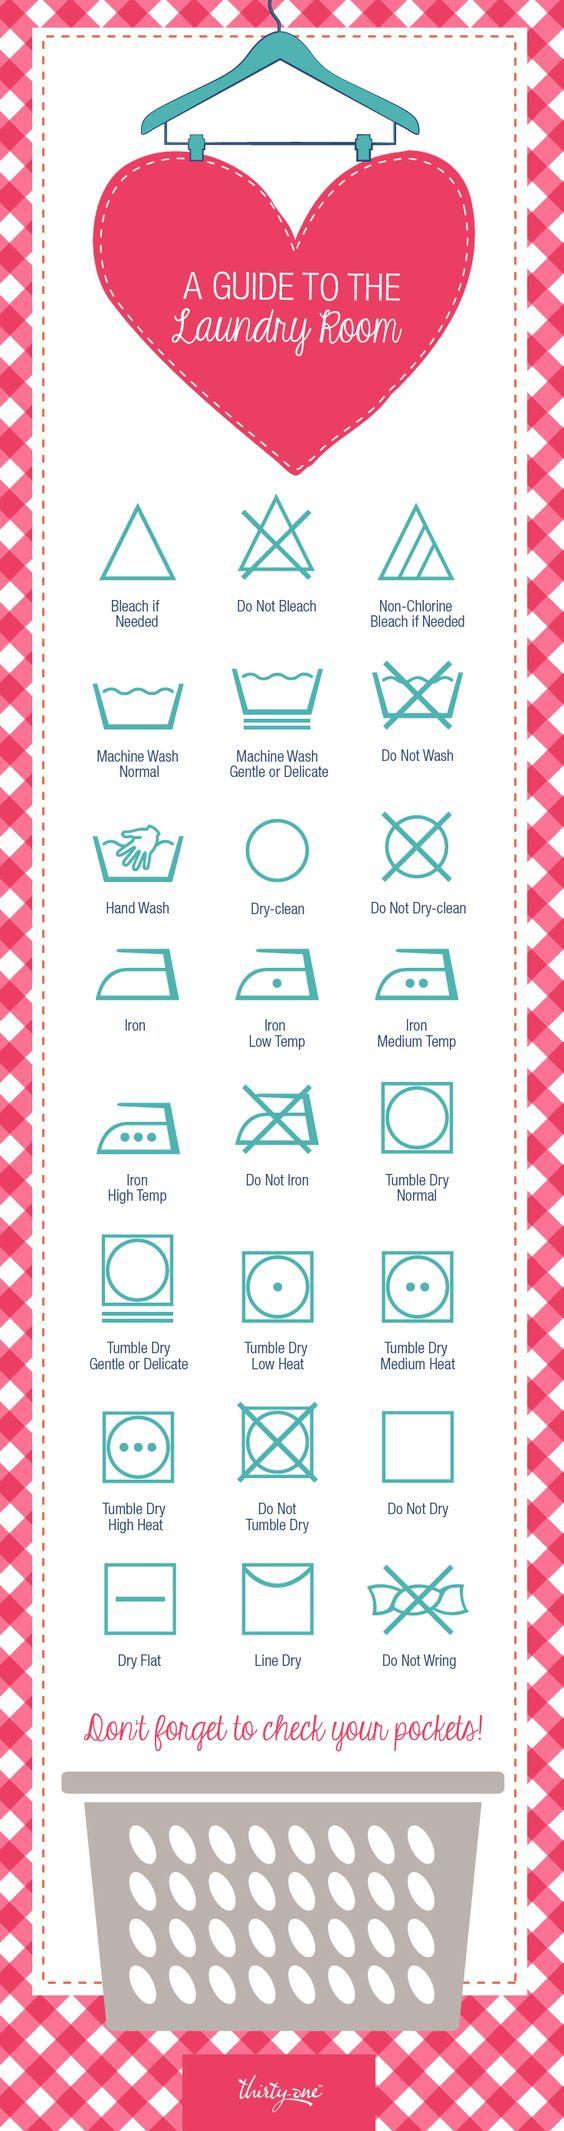 Laundry symbols meaning